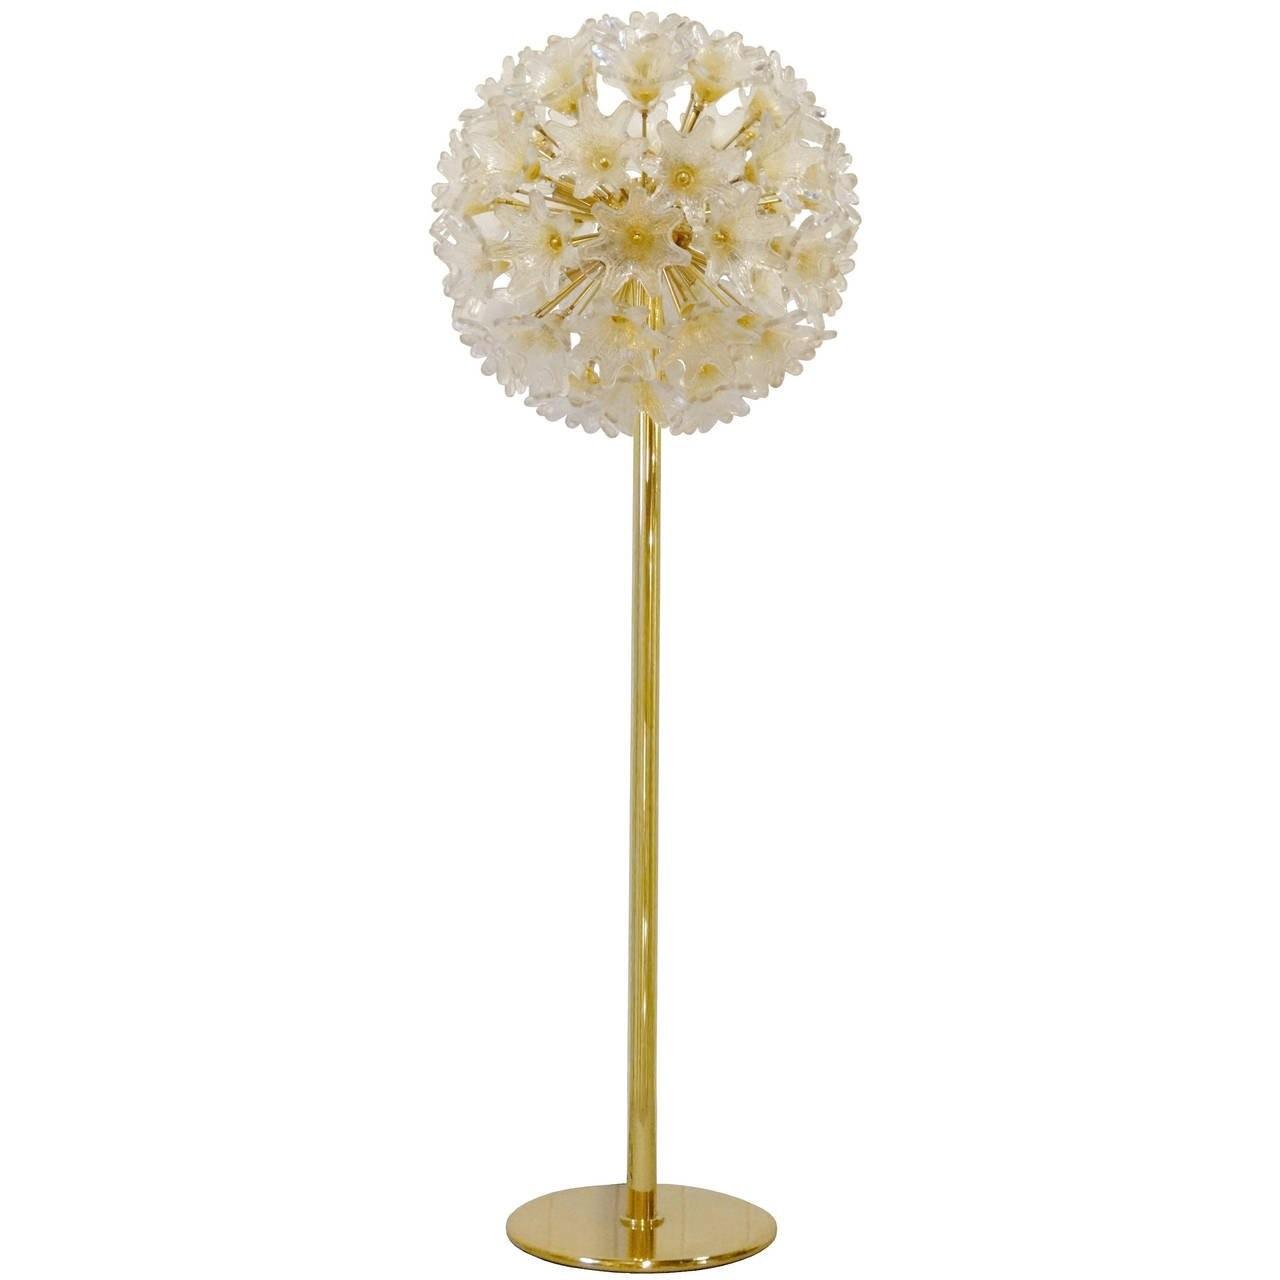 Pair of Murano Glass Flower Ball Floor Lamp